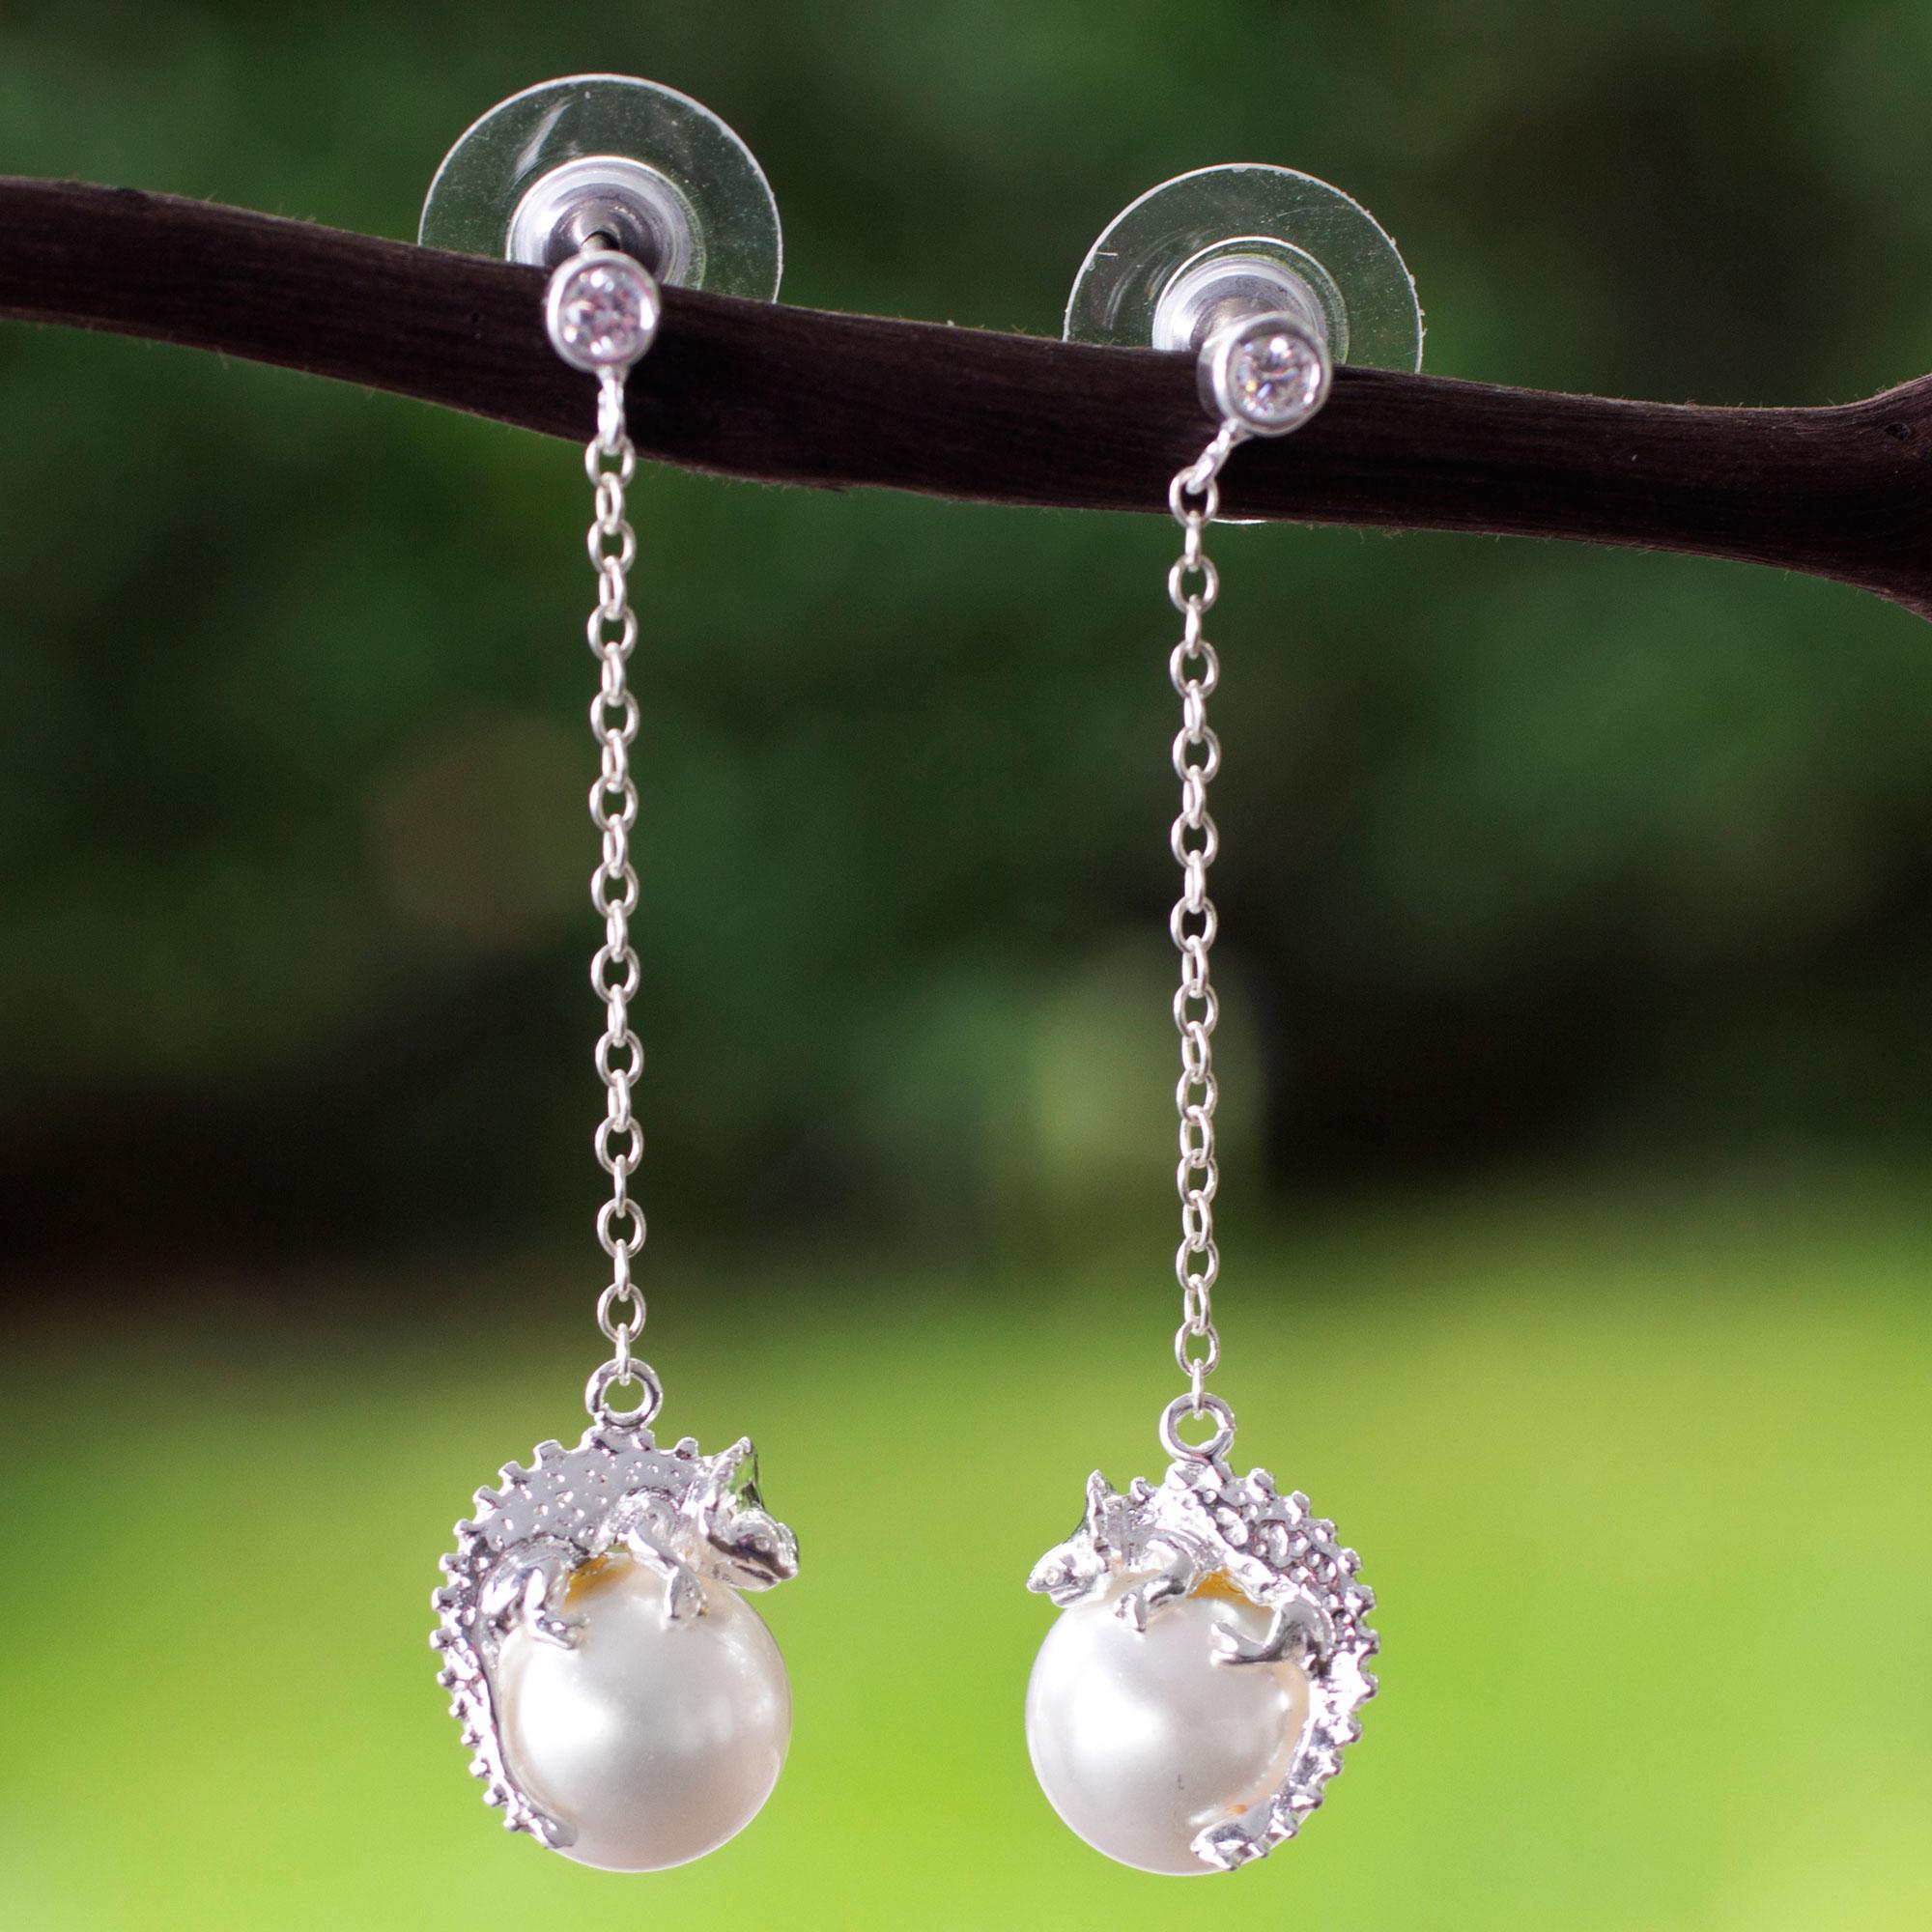 Sterling Silver Chameleon Swarovski Crystal Pearl Earrings Bright